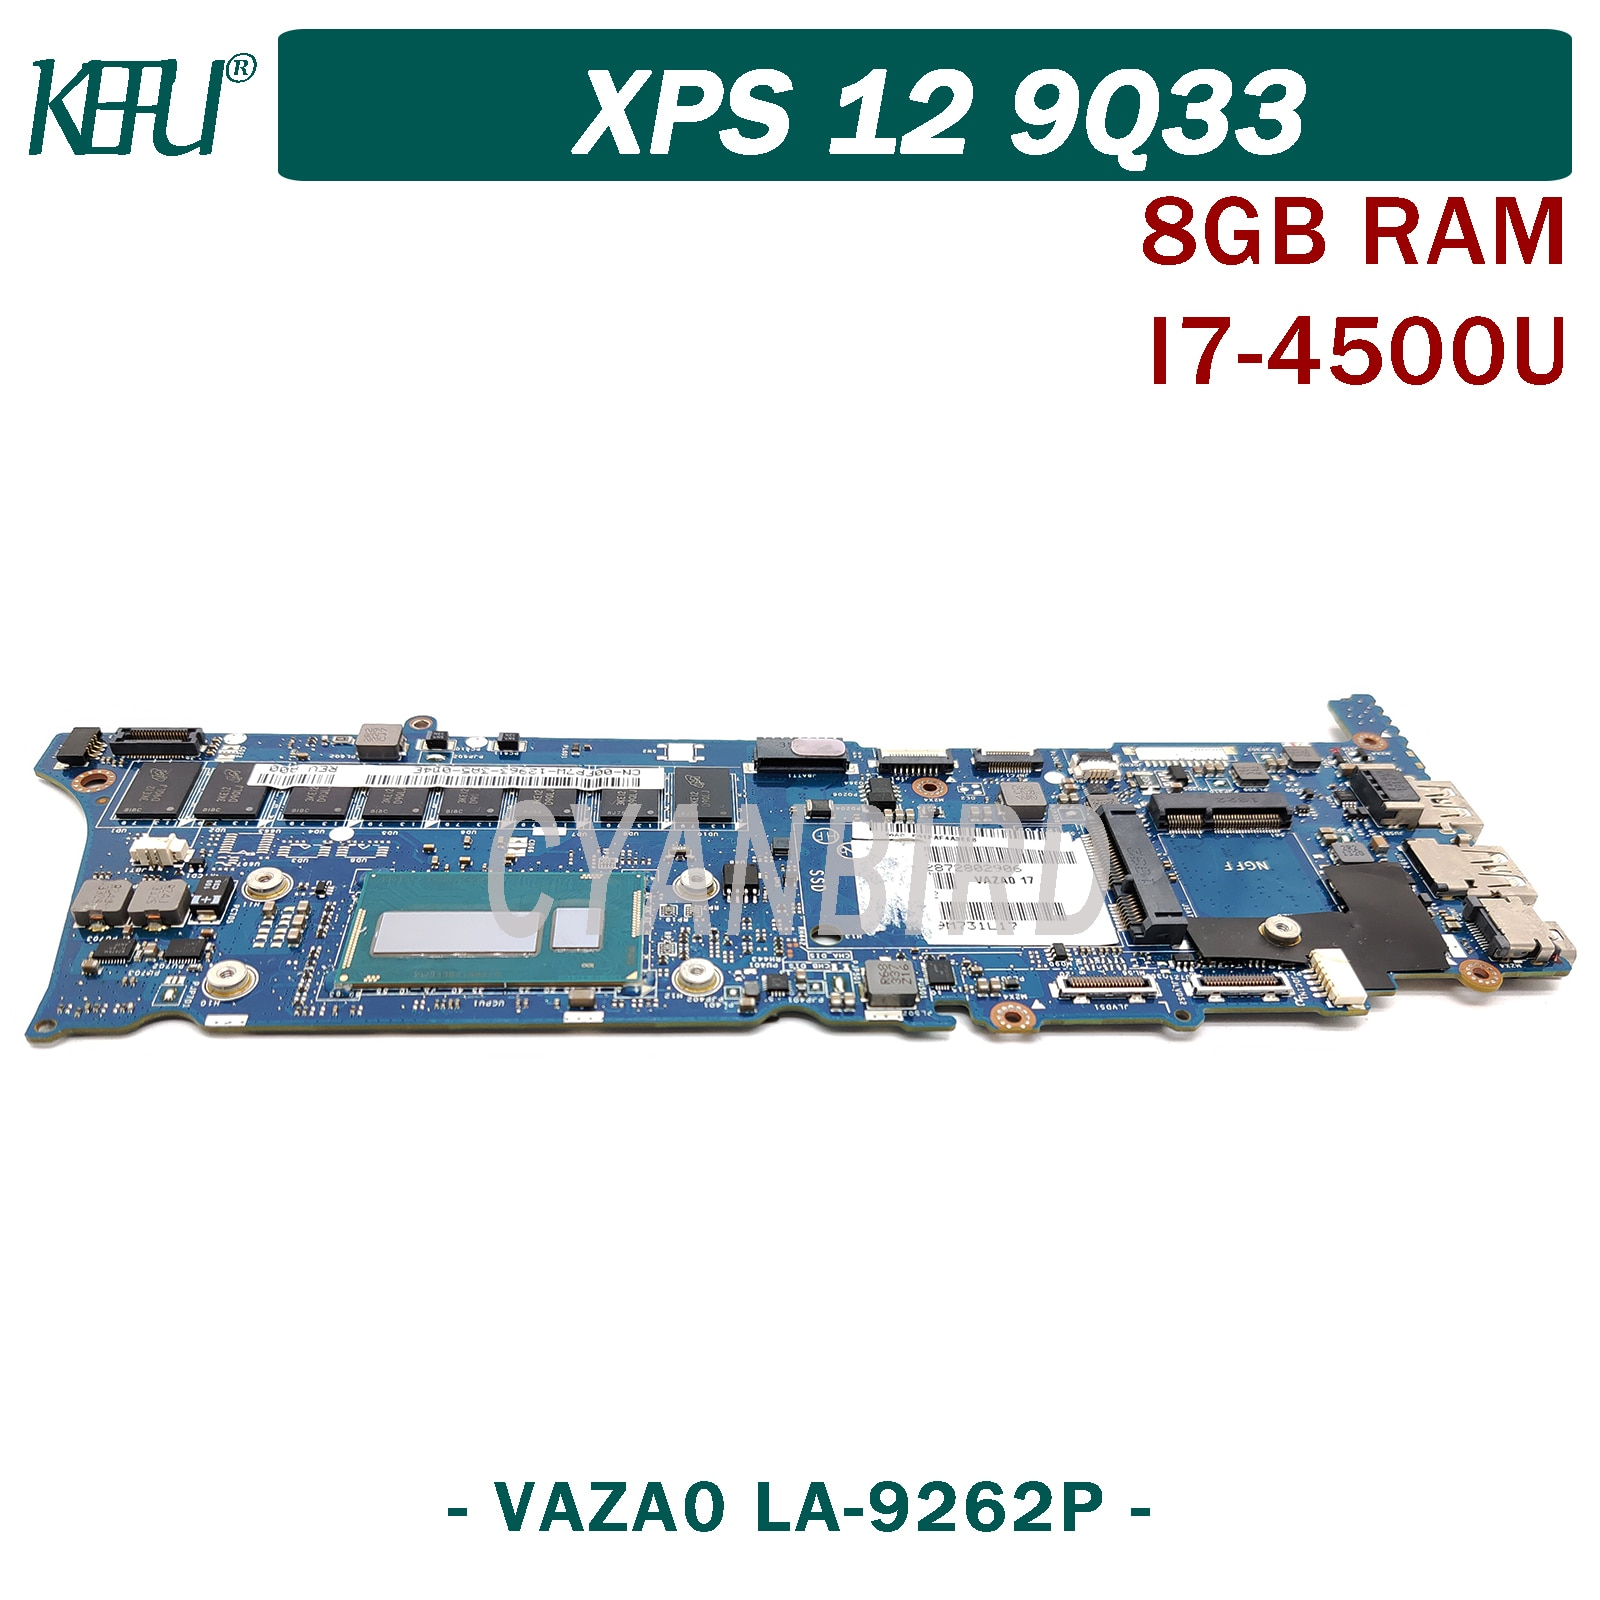 KEFU VAZA0 LA-9262P اللوحة الرئيسية الأصلية لديل XPS-12-9Q33 مع 8GB-RAM I7-4500U اللوحة الأم للكمبيوتر المحمول